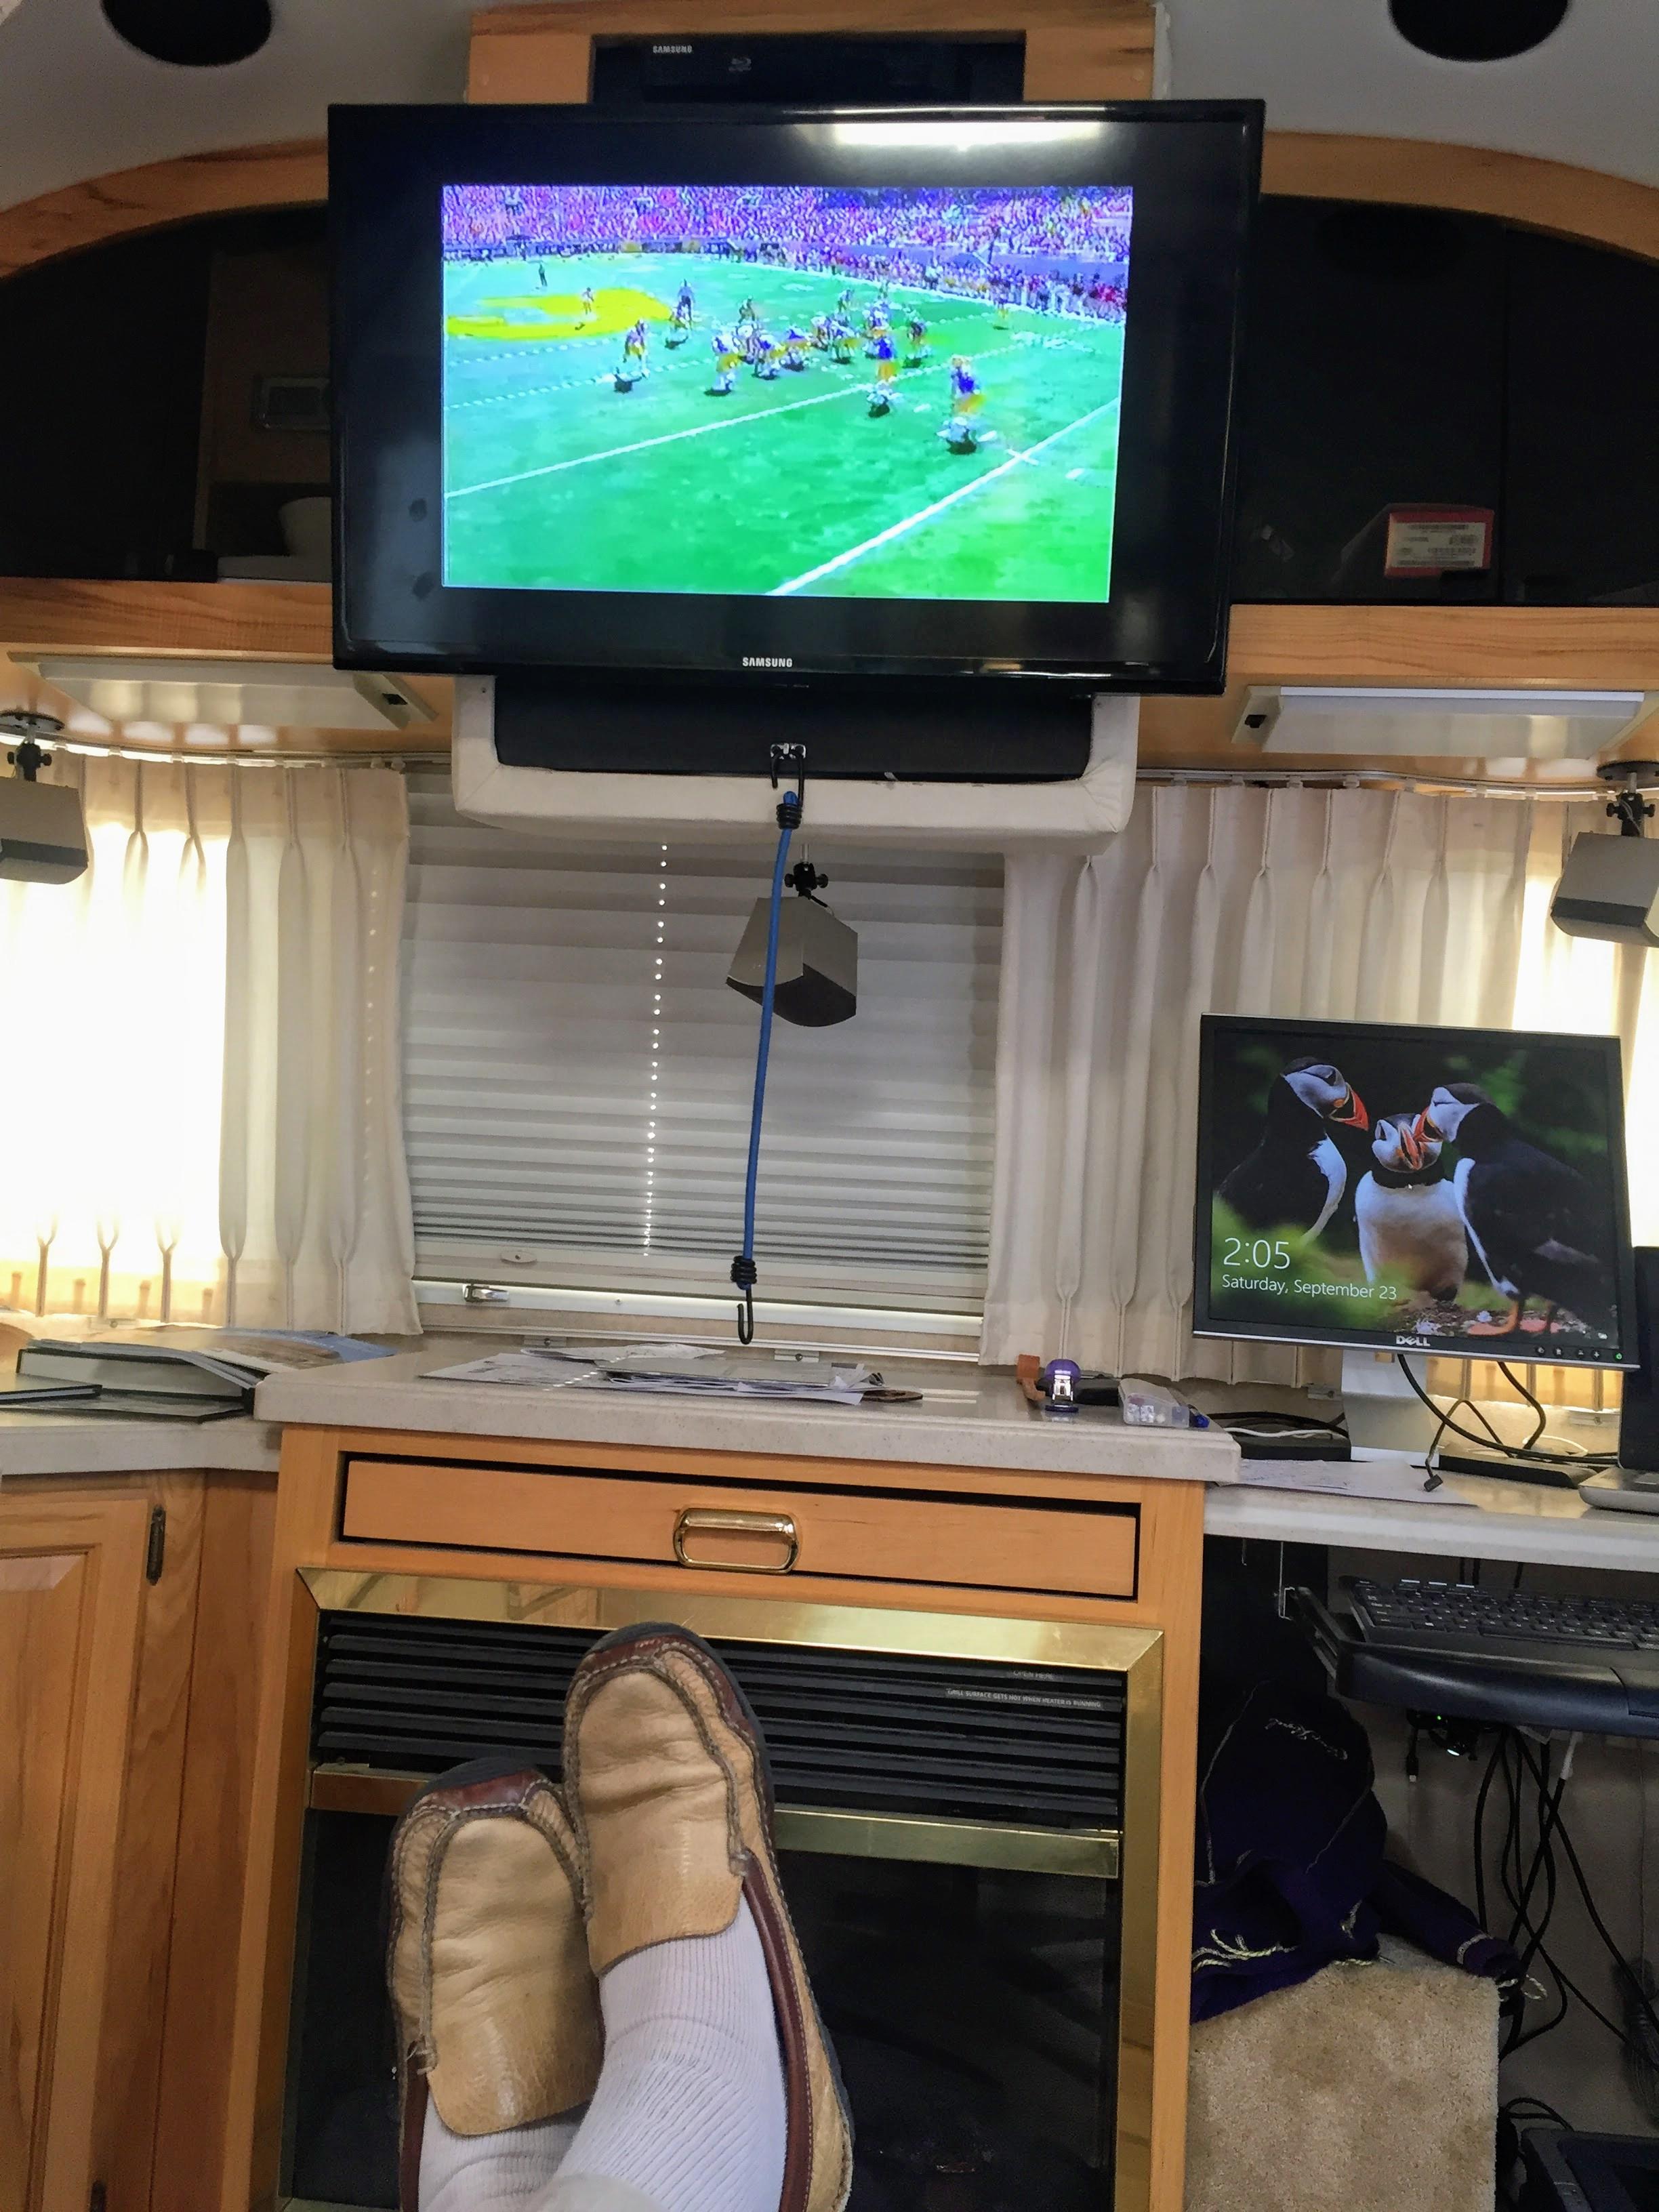 2017-09-23 Saturday College Football